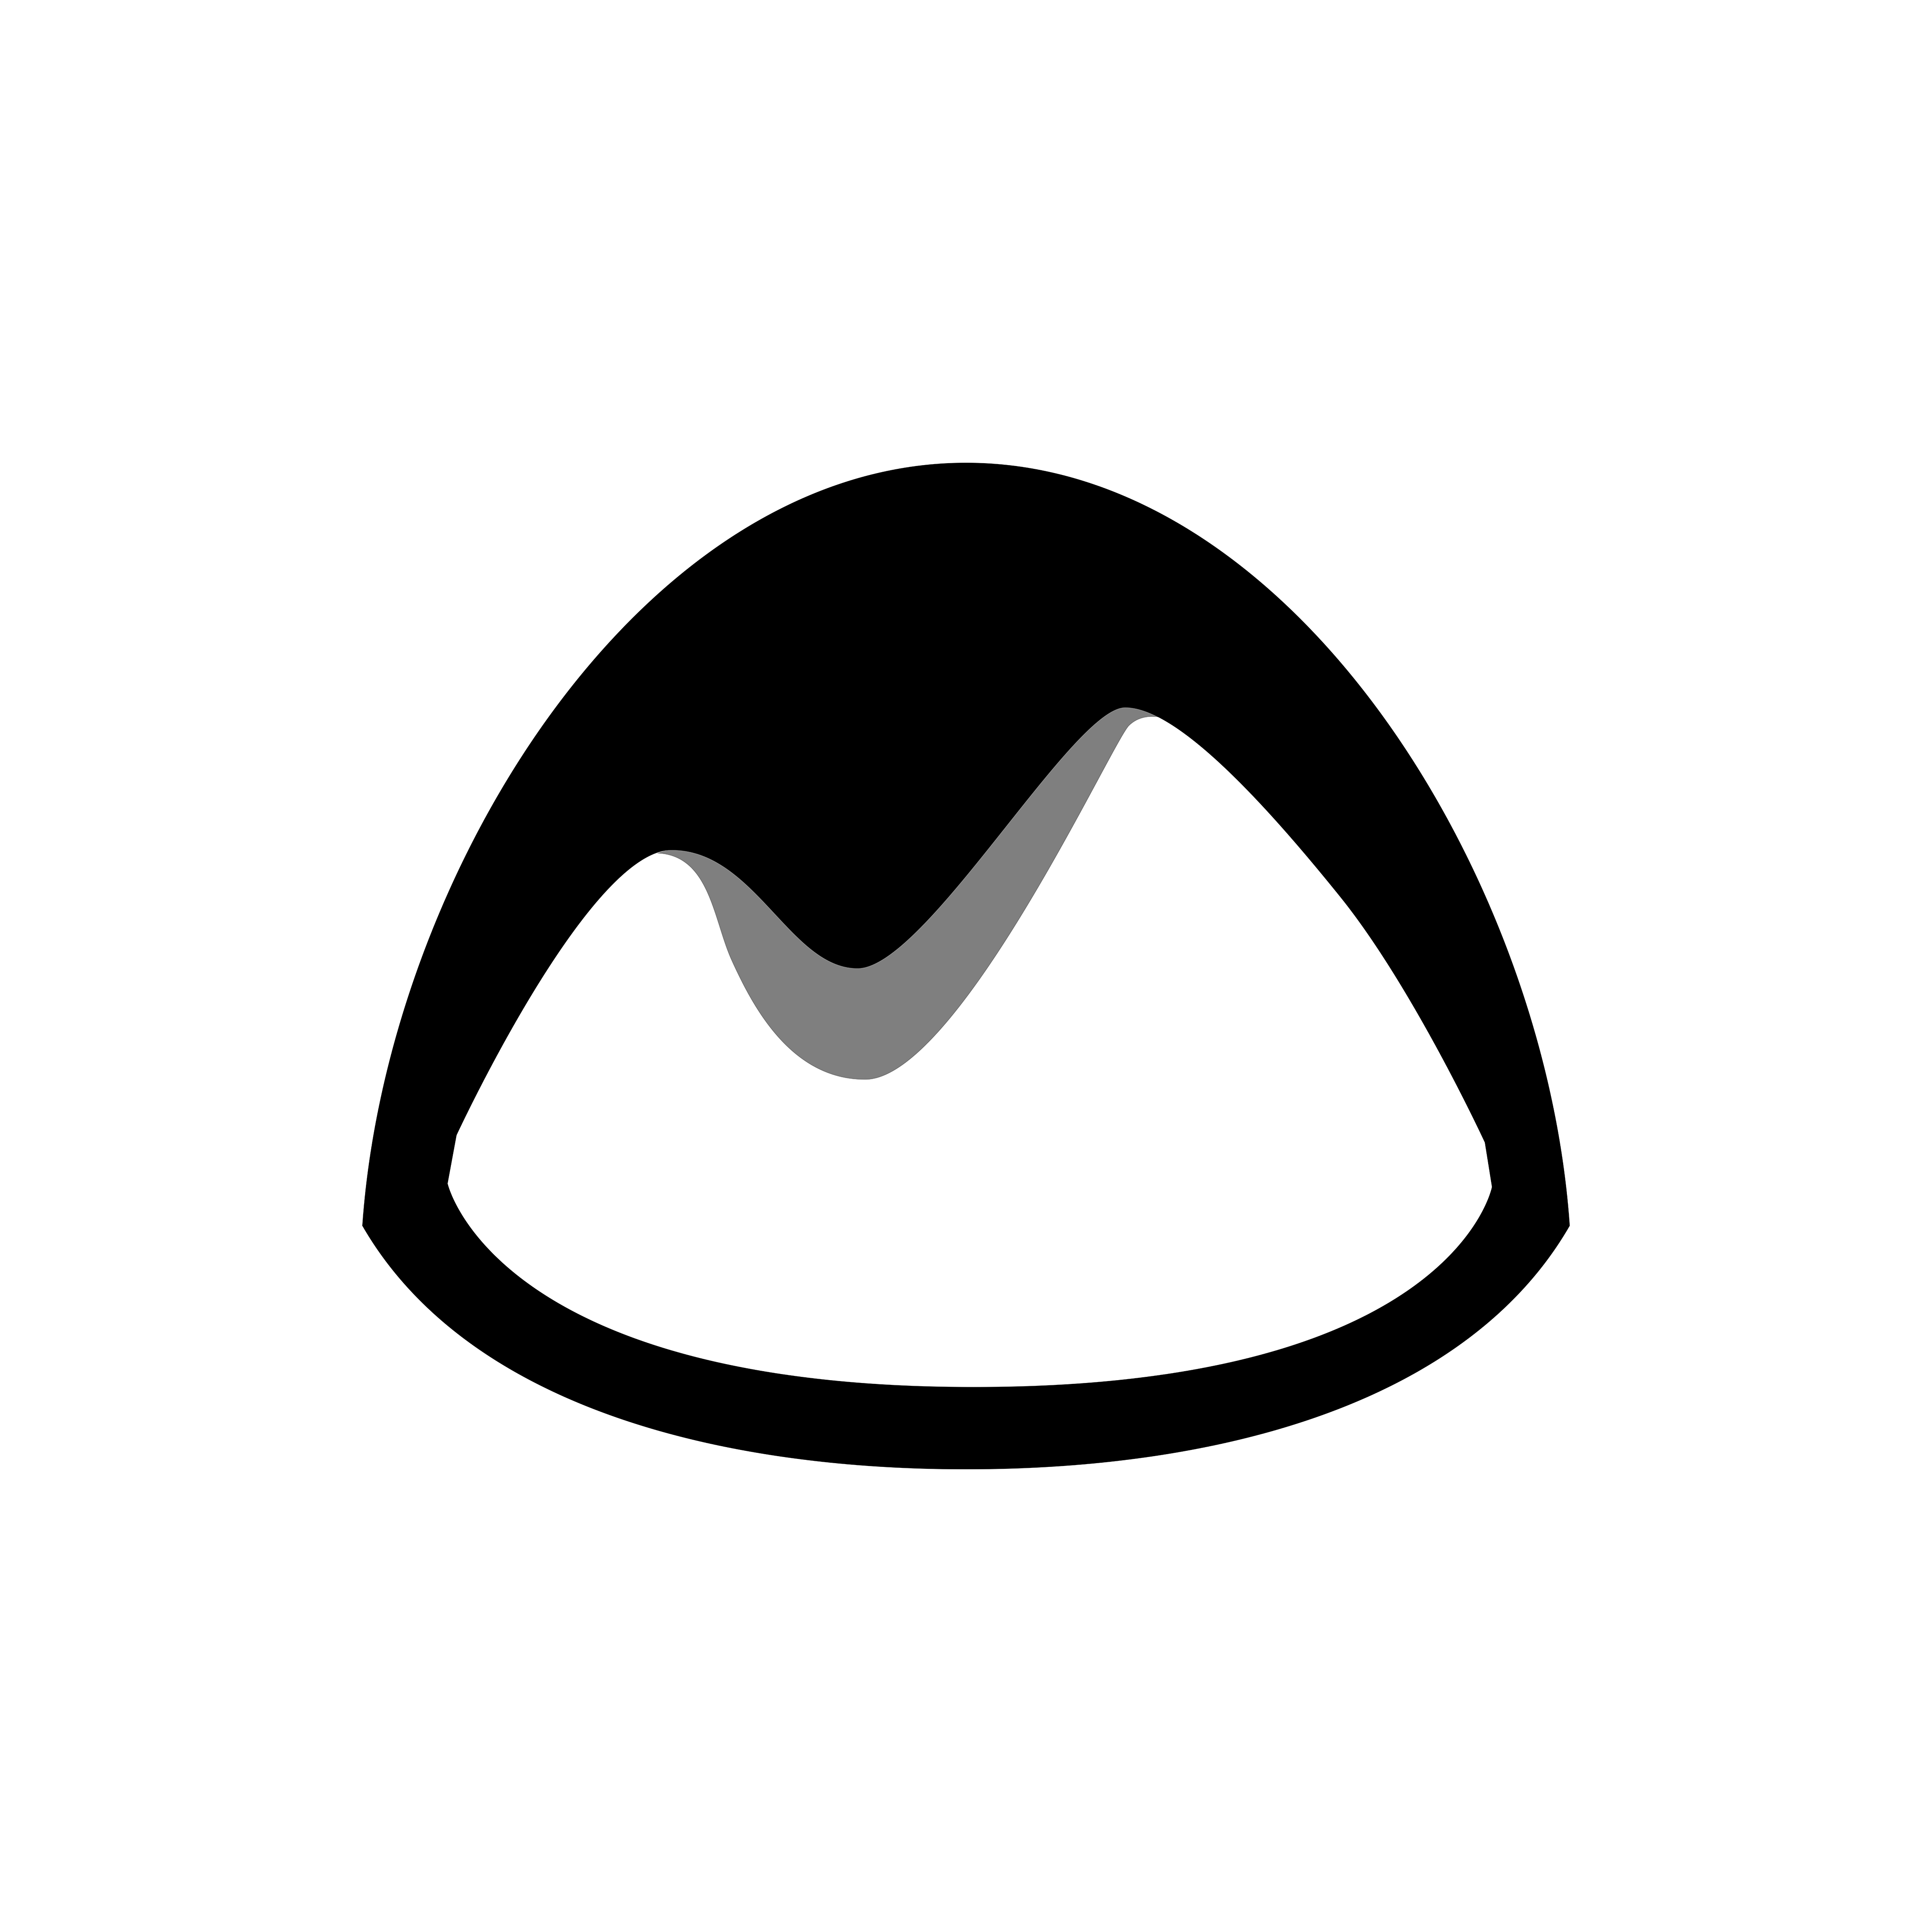 black, basecamp icon